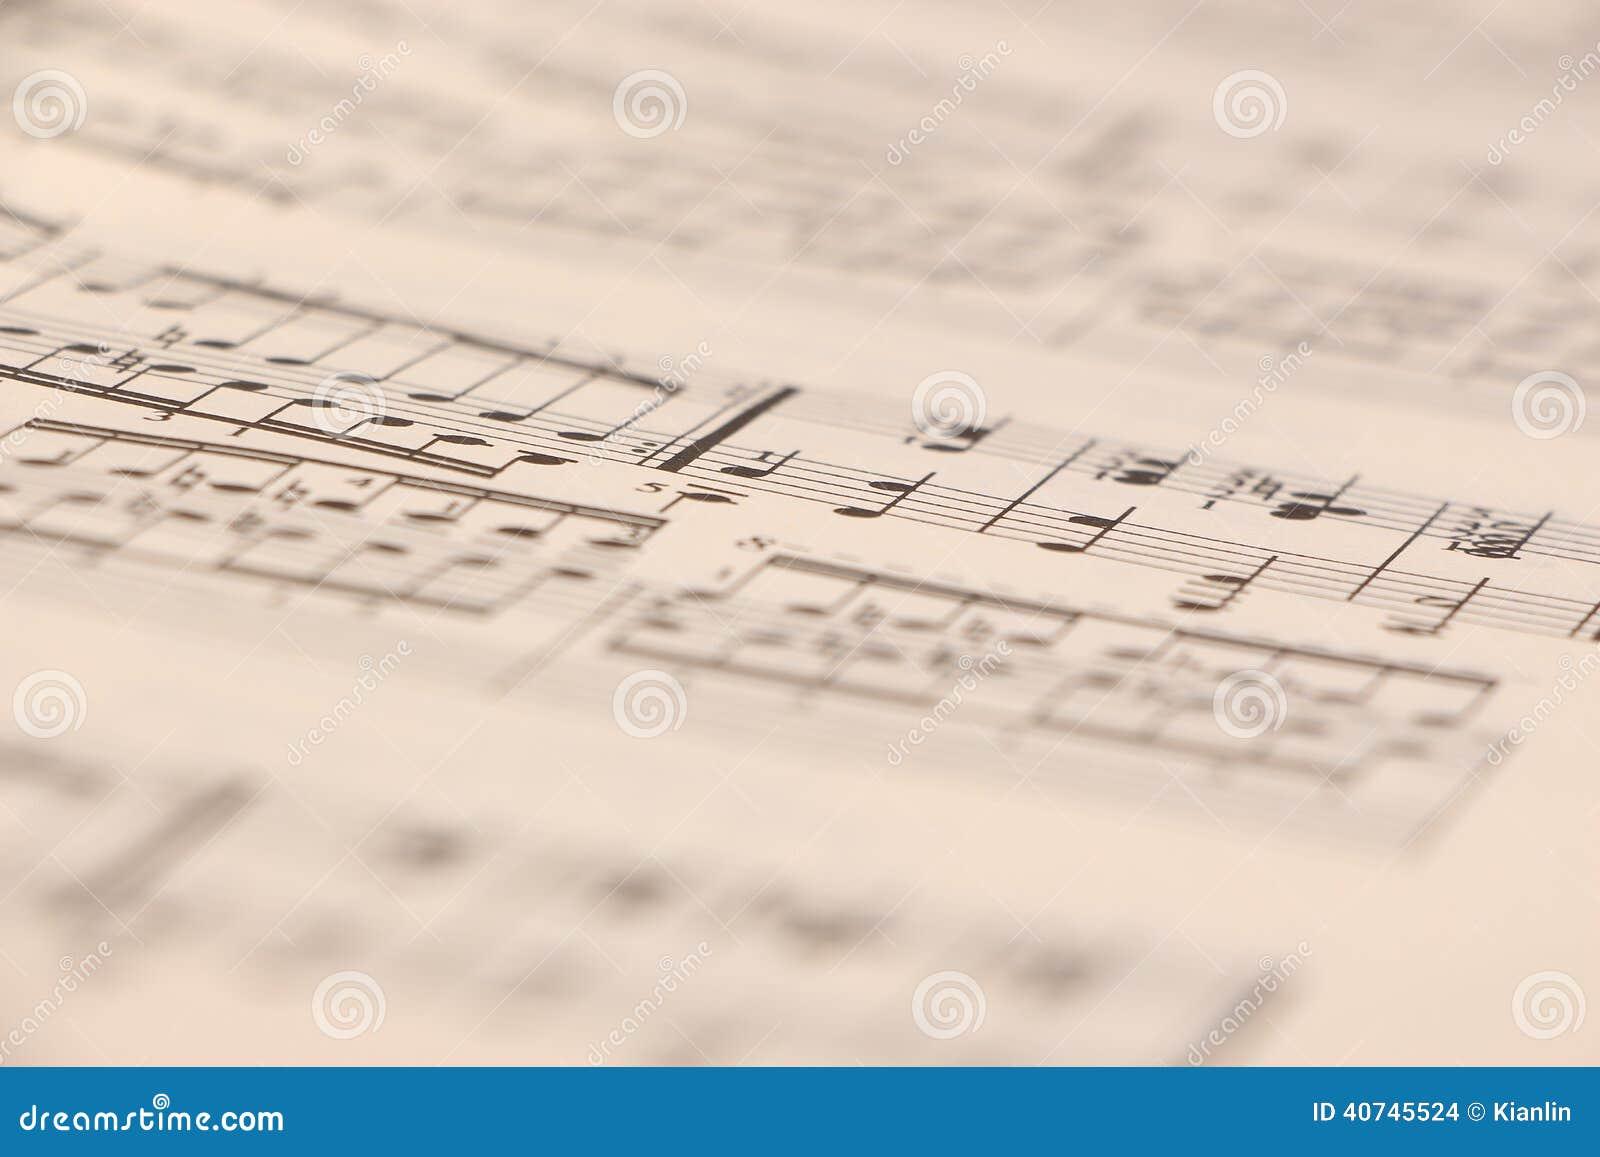 Sheet music stock photo  Image of focus, close, binary - 40745524